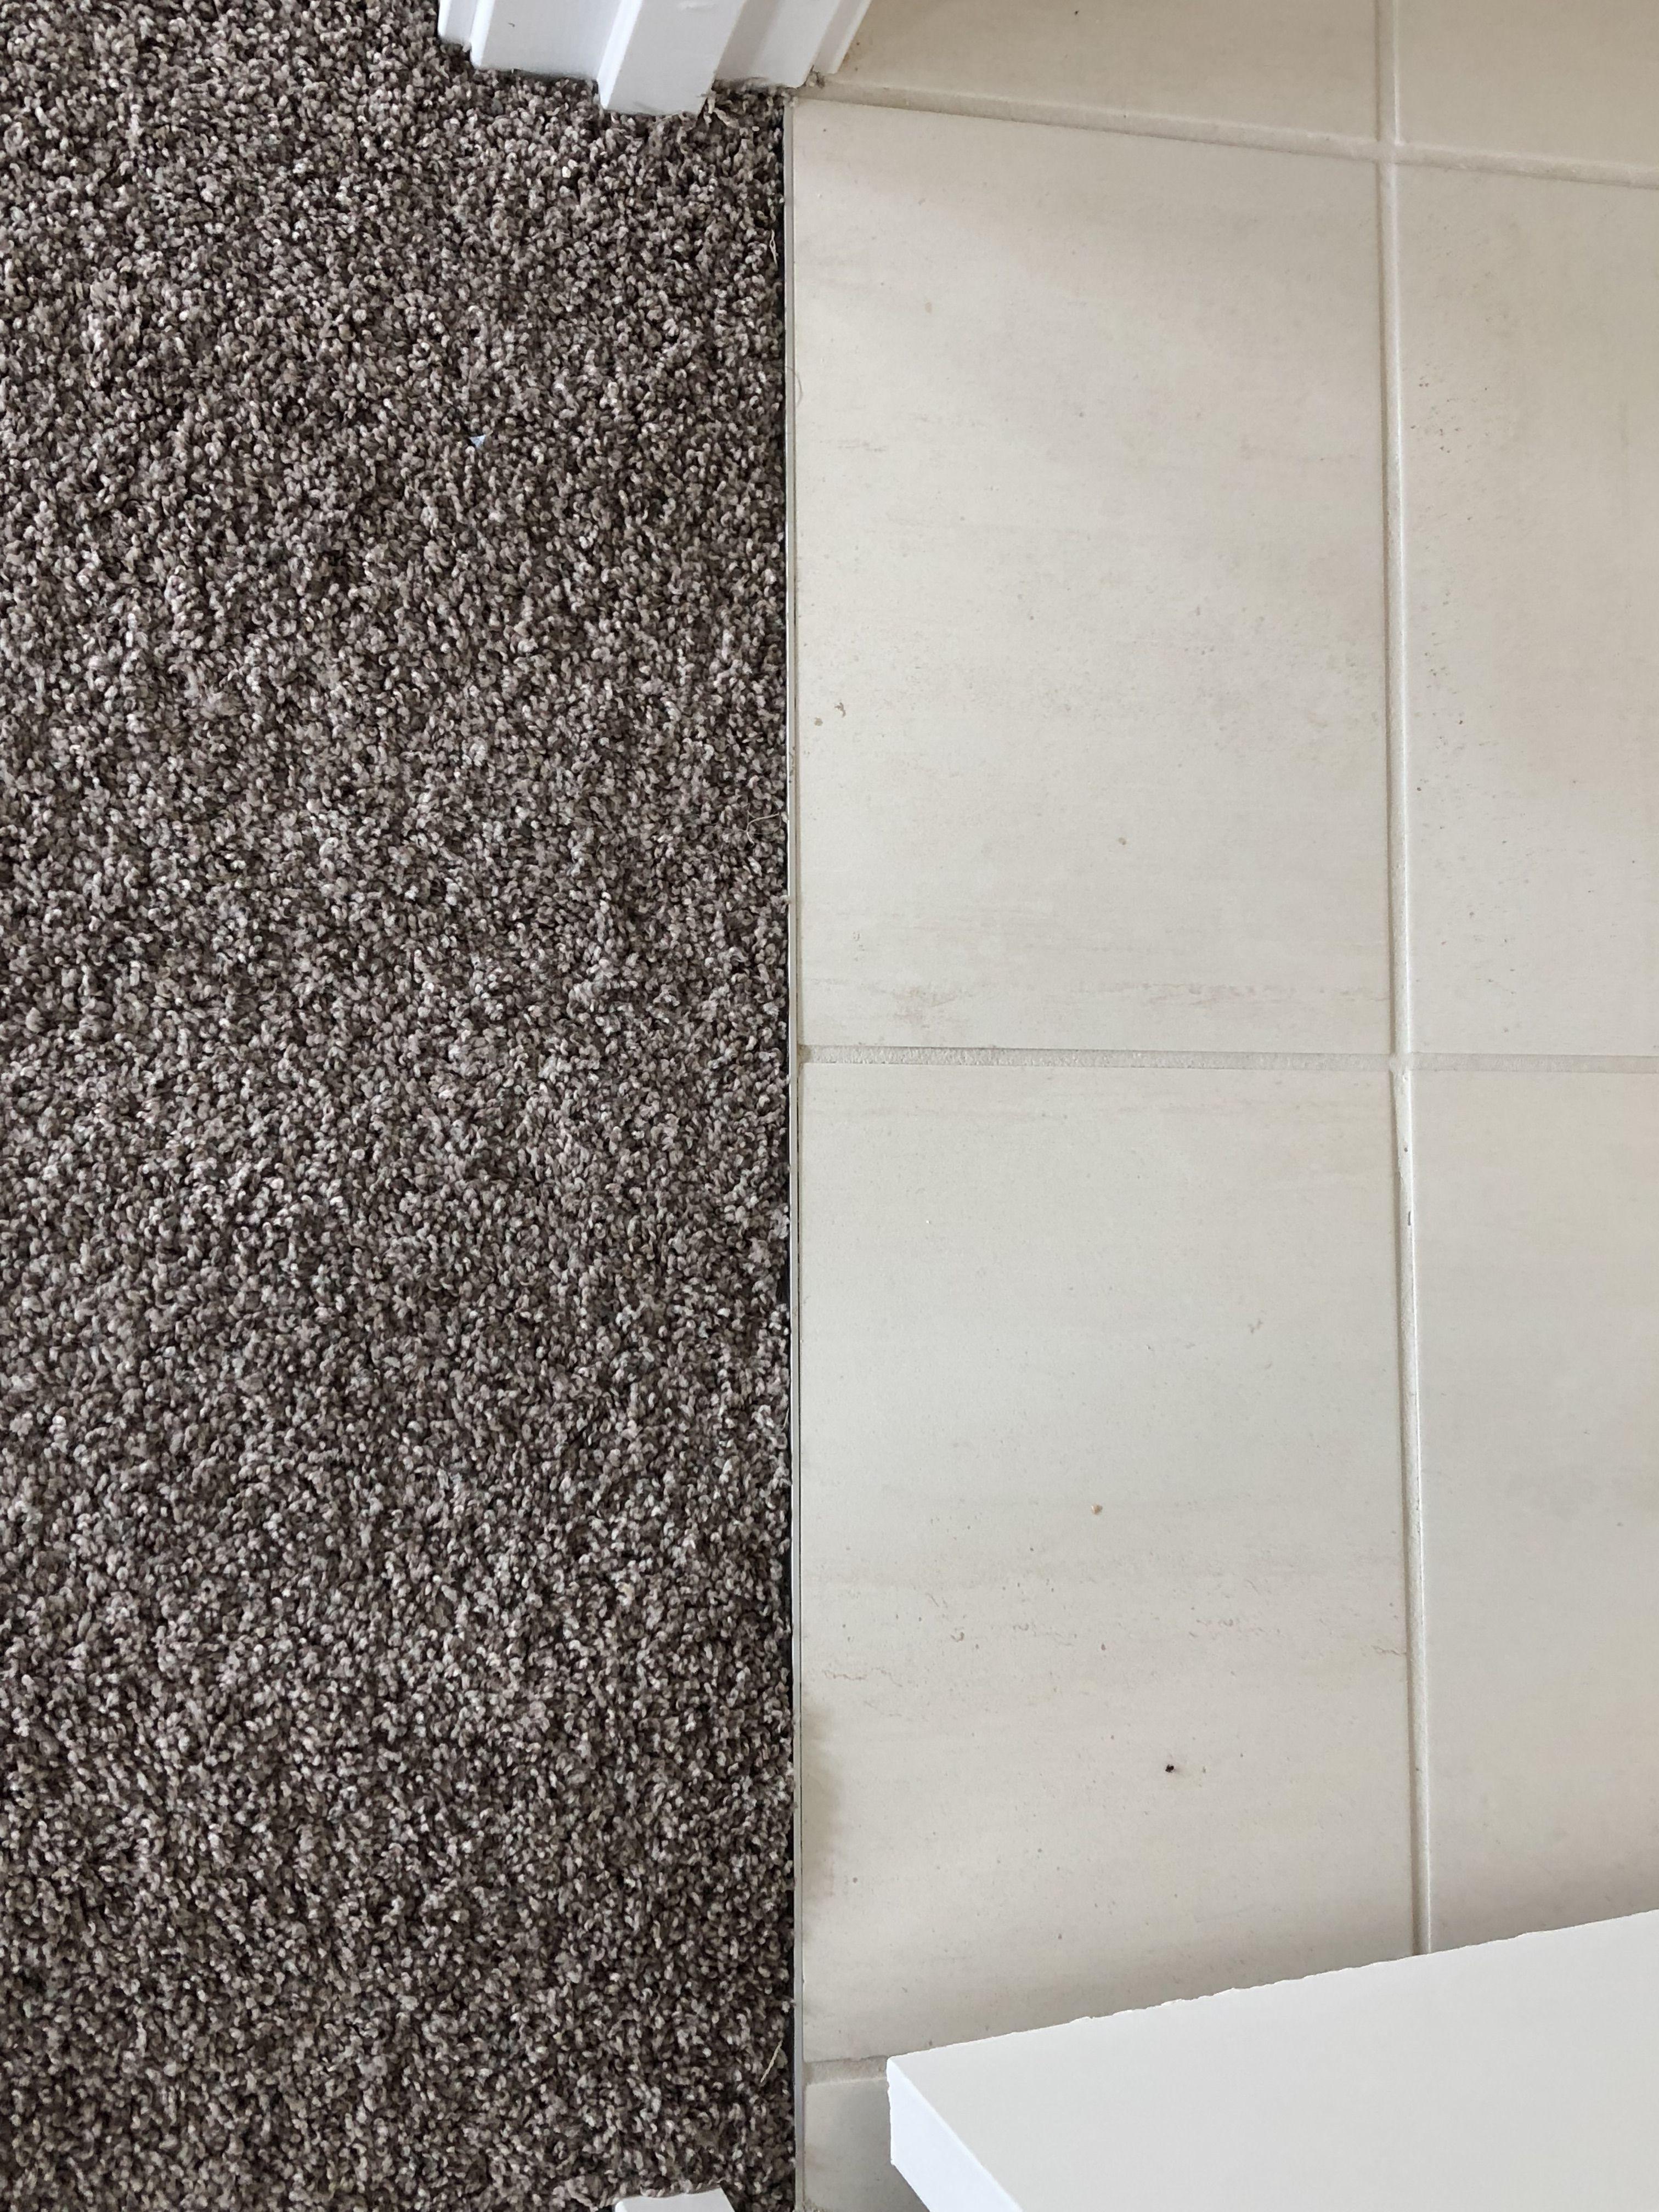 TRANSITION STRIP BETWEEN TILE AND CARPET Carpet to tile